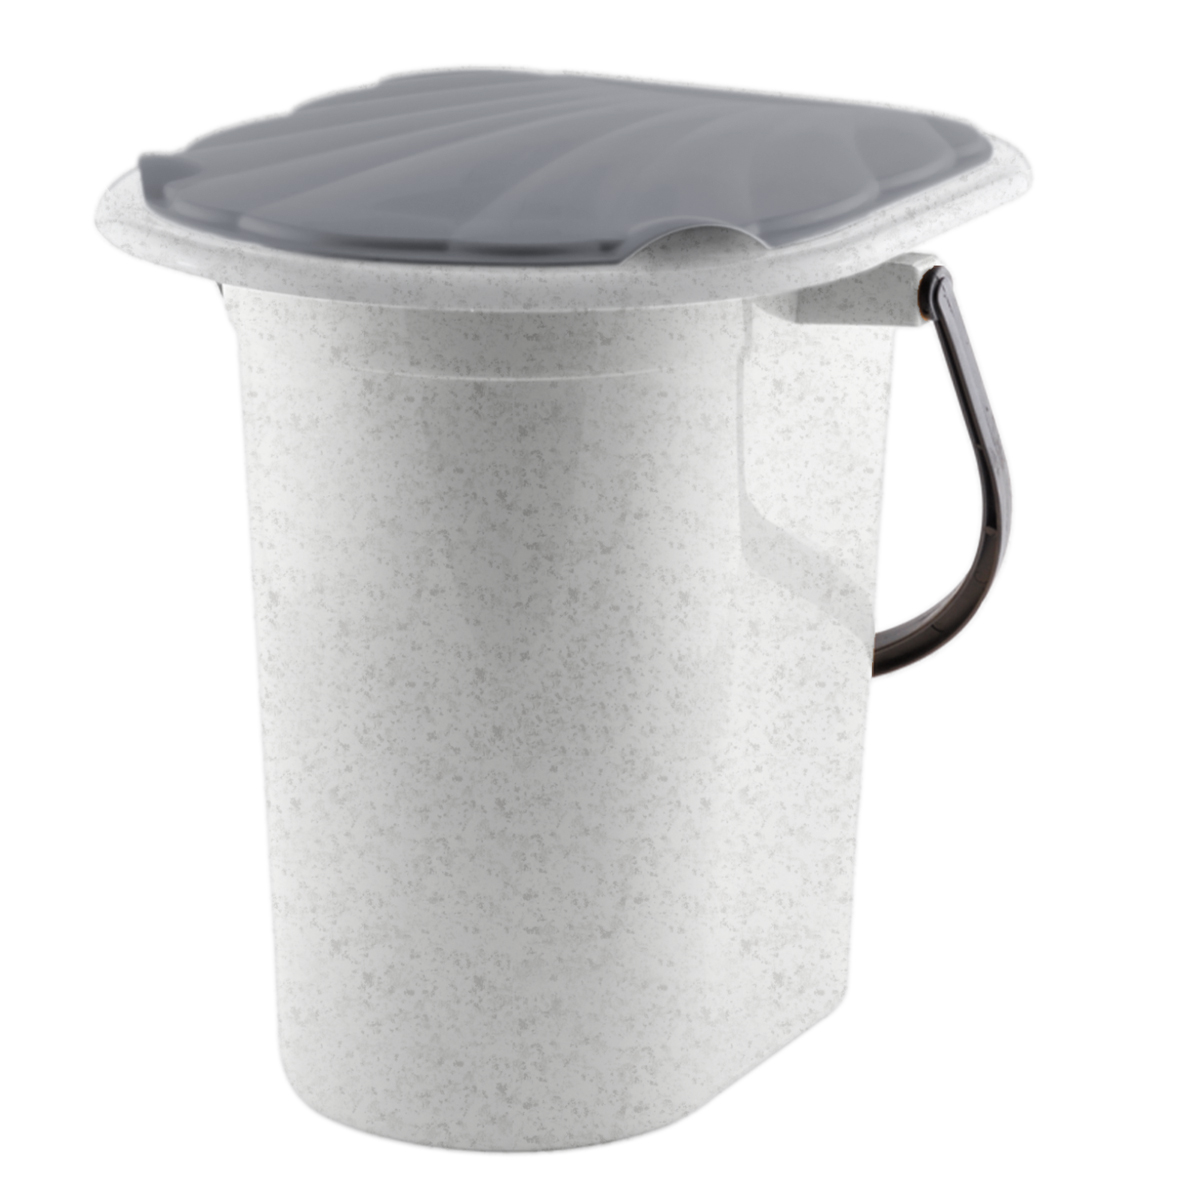 Ведро-туалет  InGreen , цвет: мраморный, серый, 18 л - Биотуалеты и септики